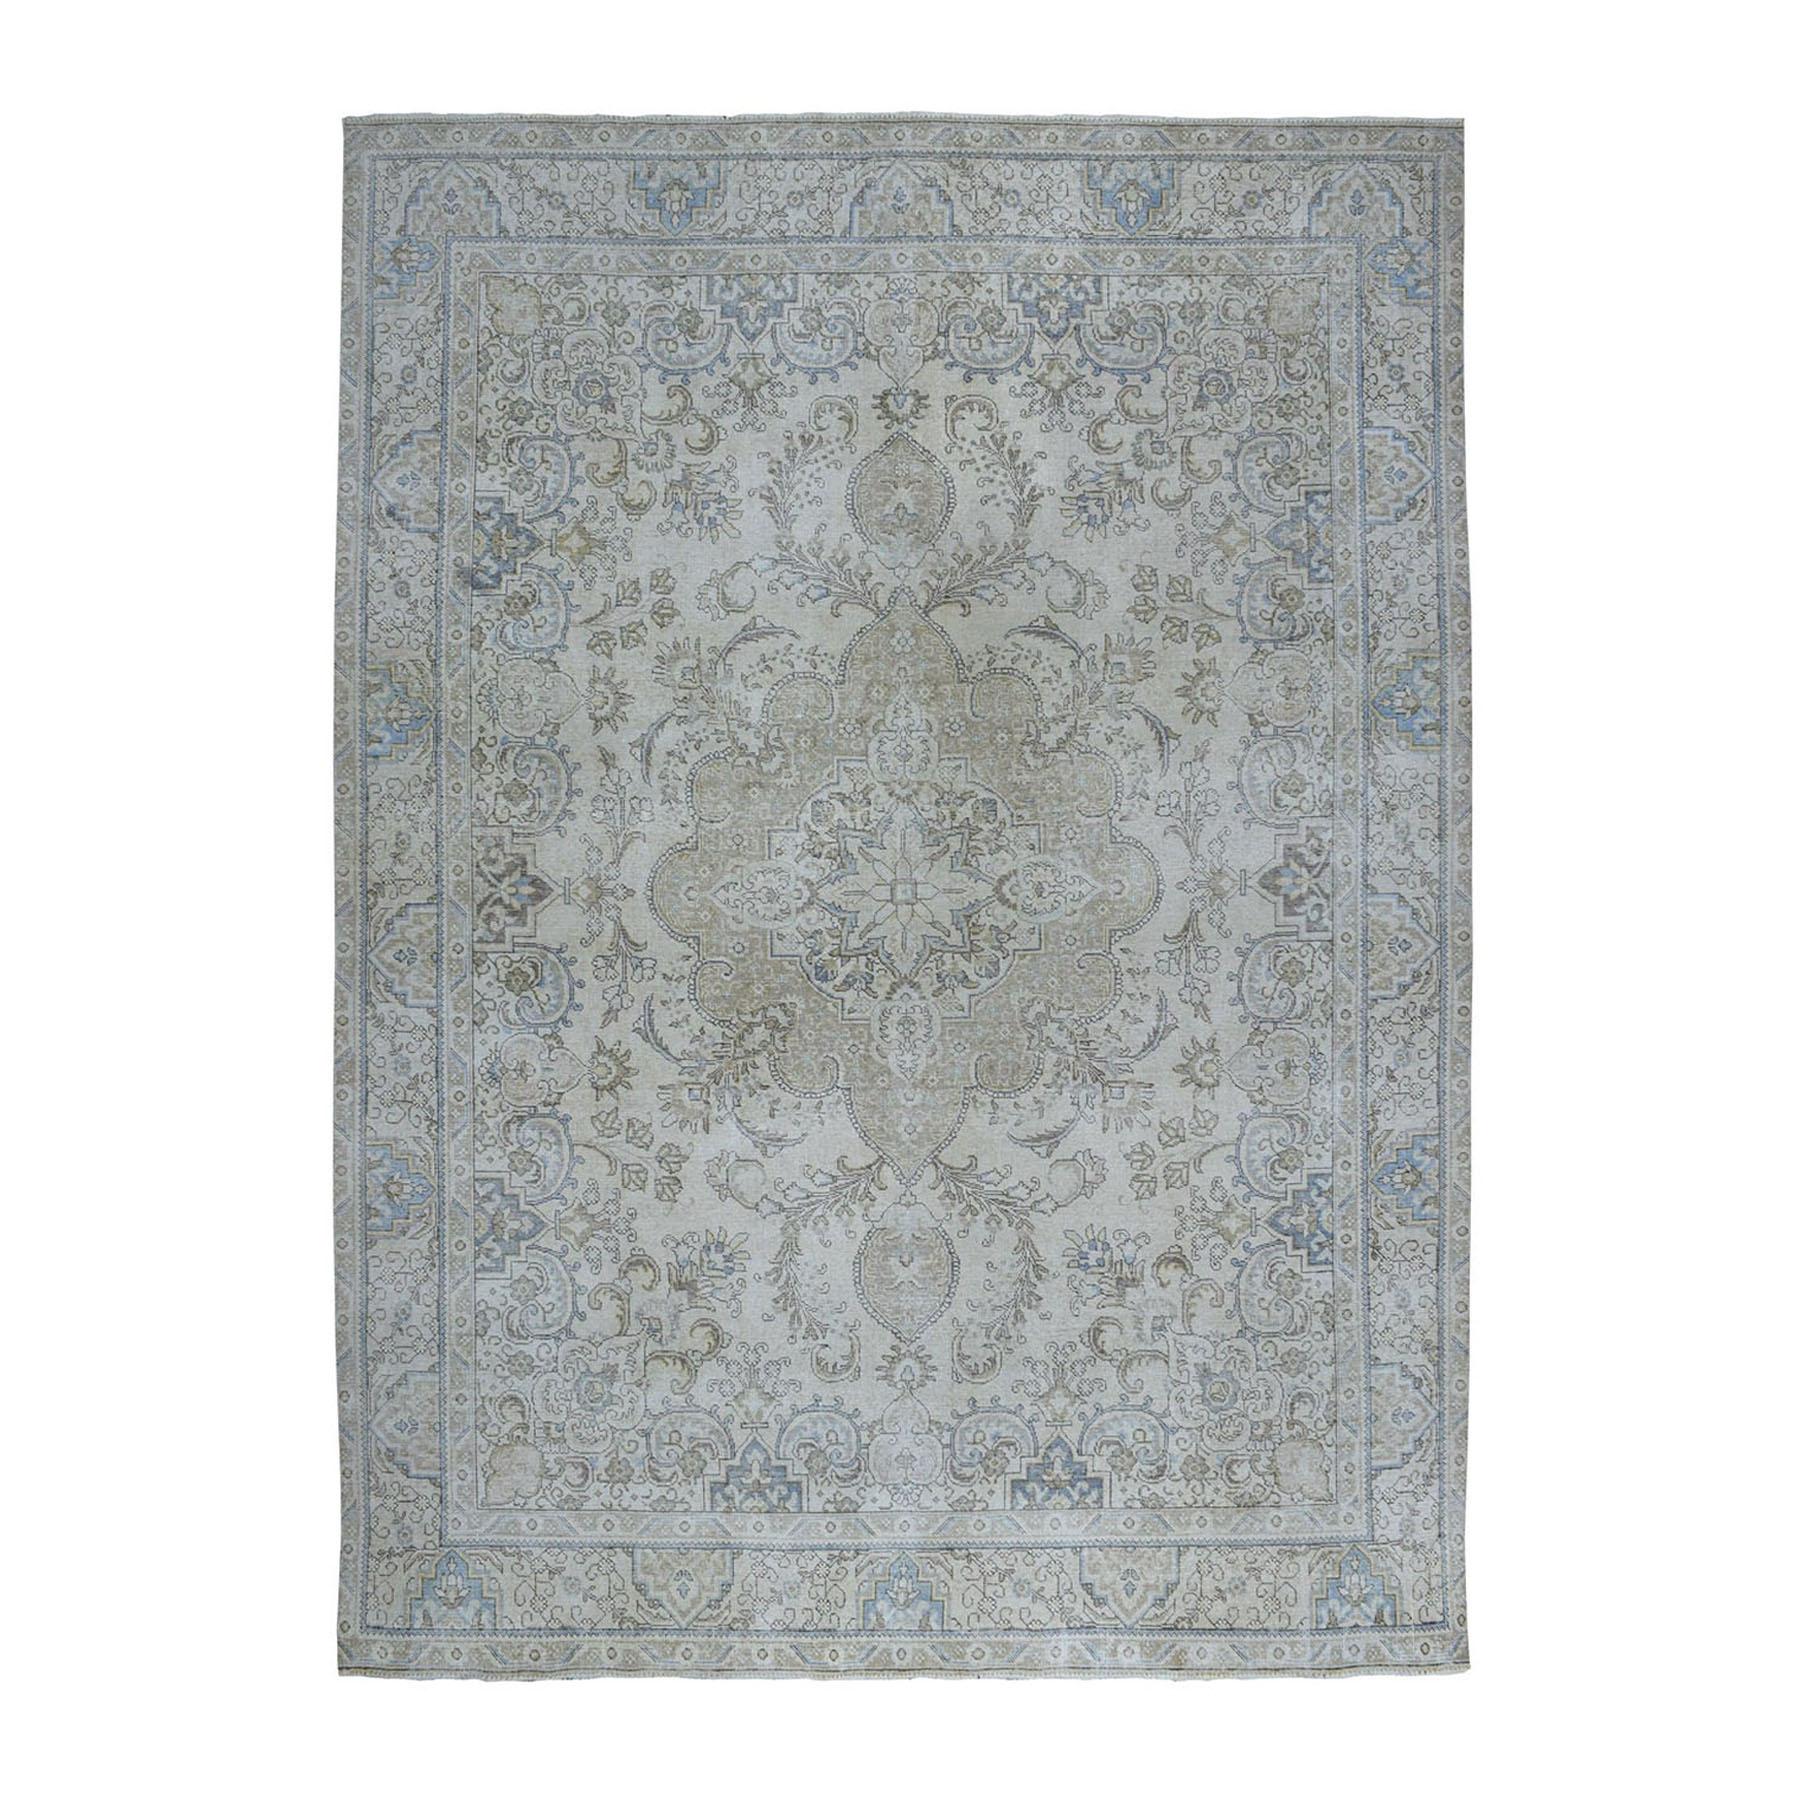 "9'6""X12'8"" Beige Vintage White Wash Tabriz Worn Wool Tribal Hand-Knotted Oriental Rug moae06a9"